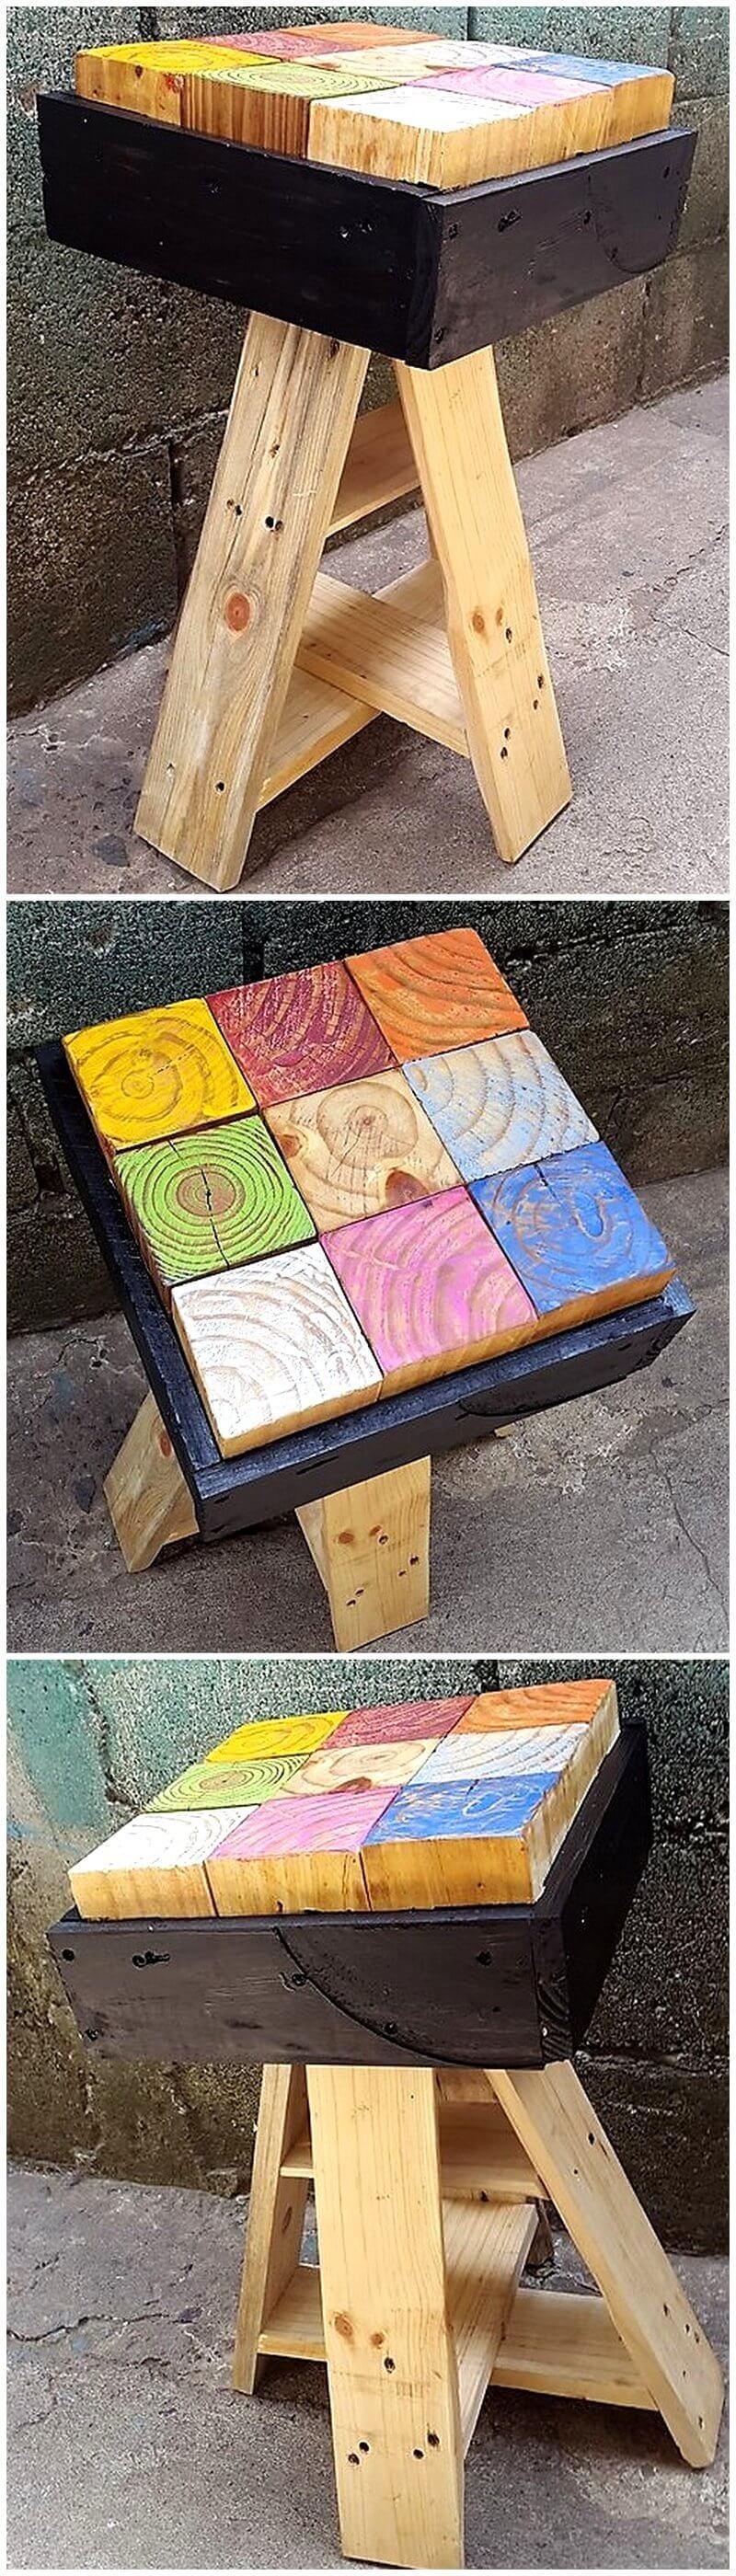 pallet artistic stool